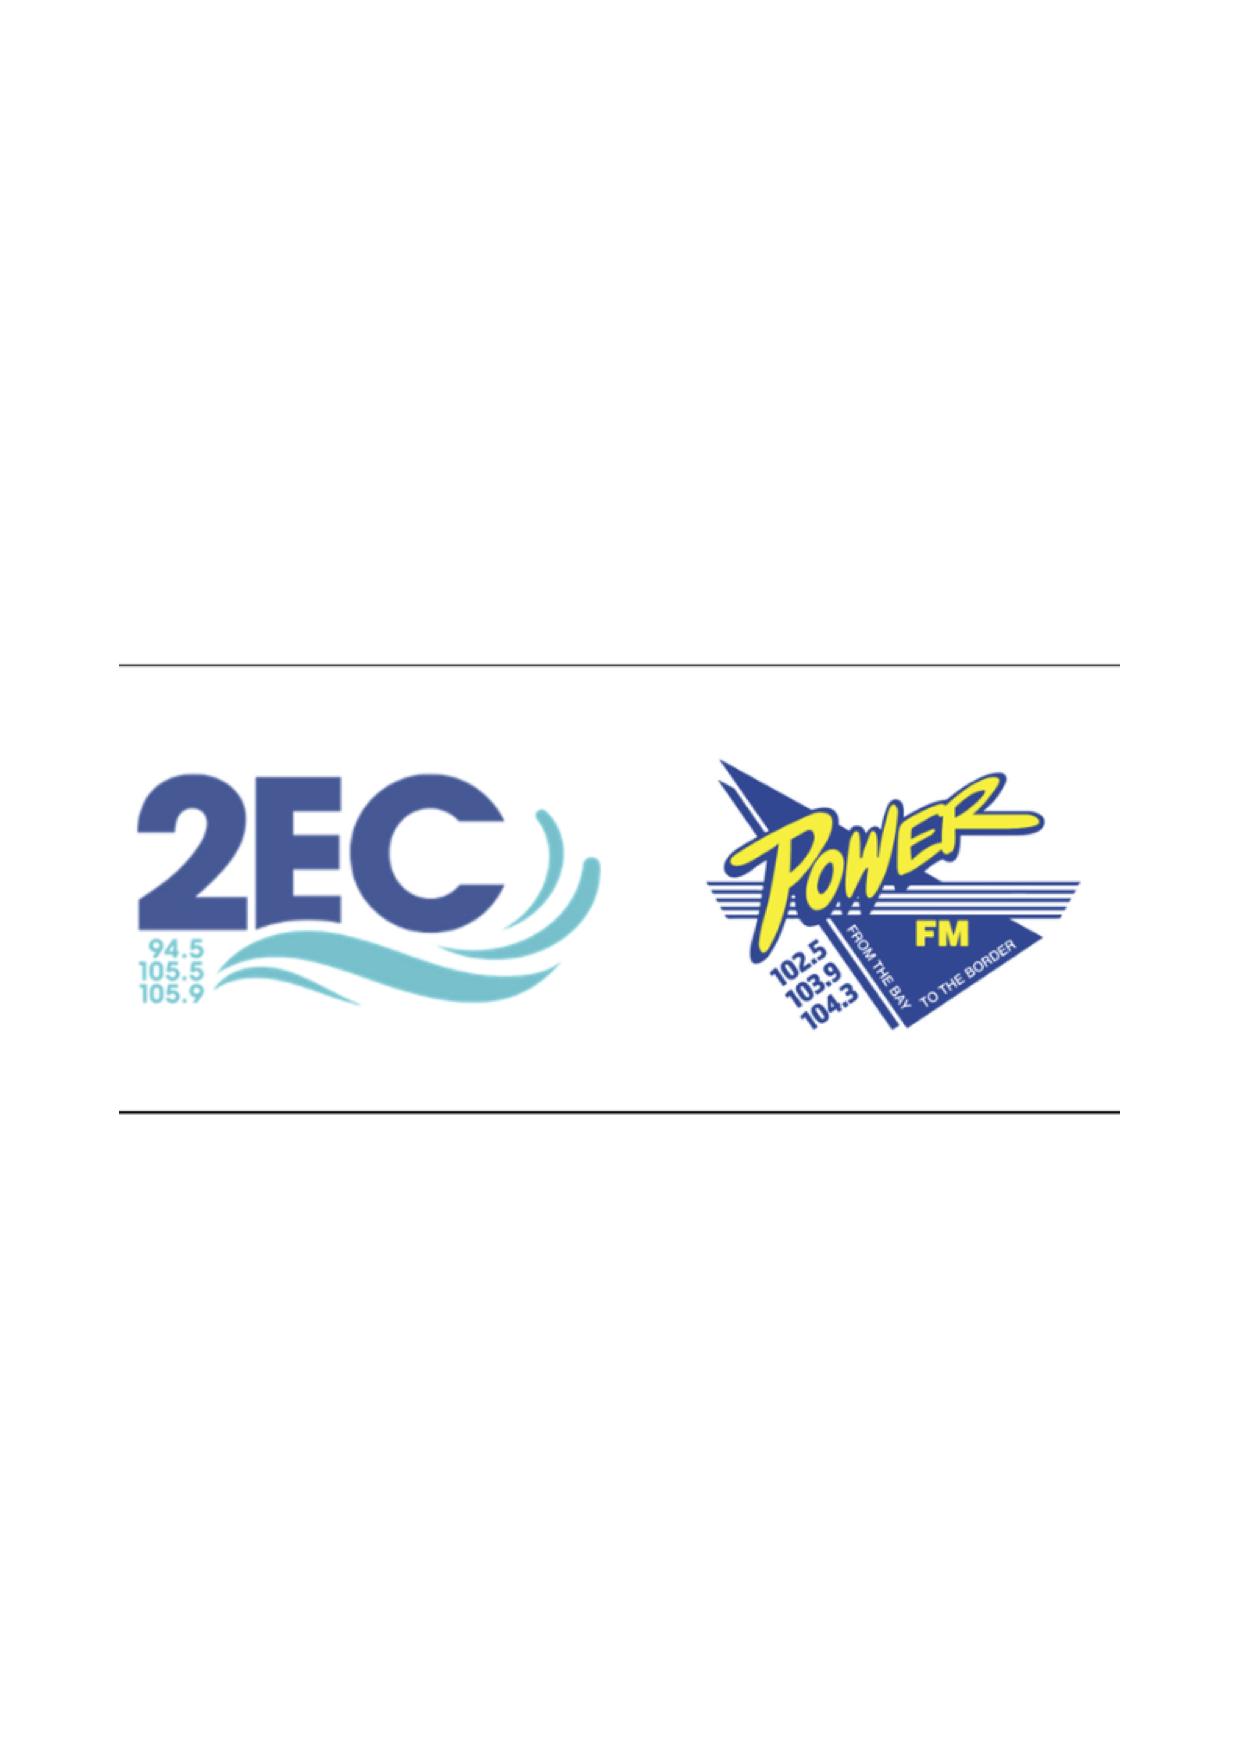 East Coast Radio – Power FM and 2EC